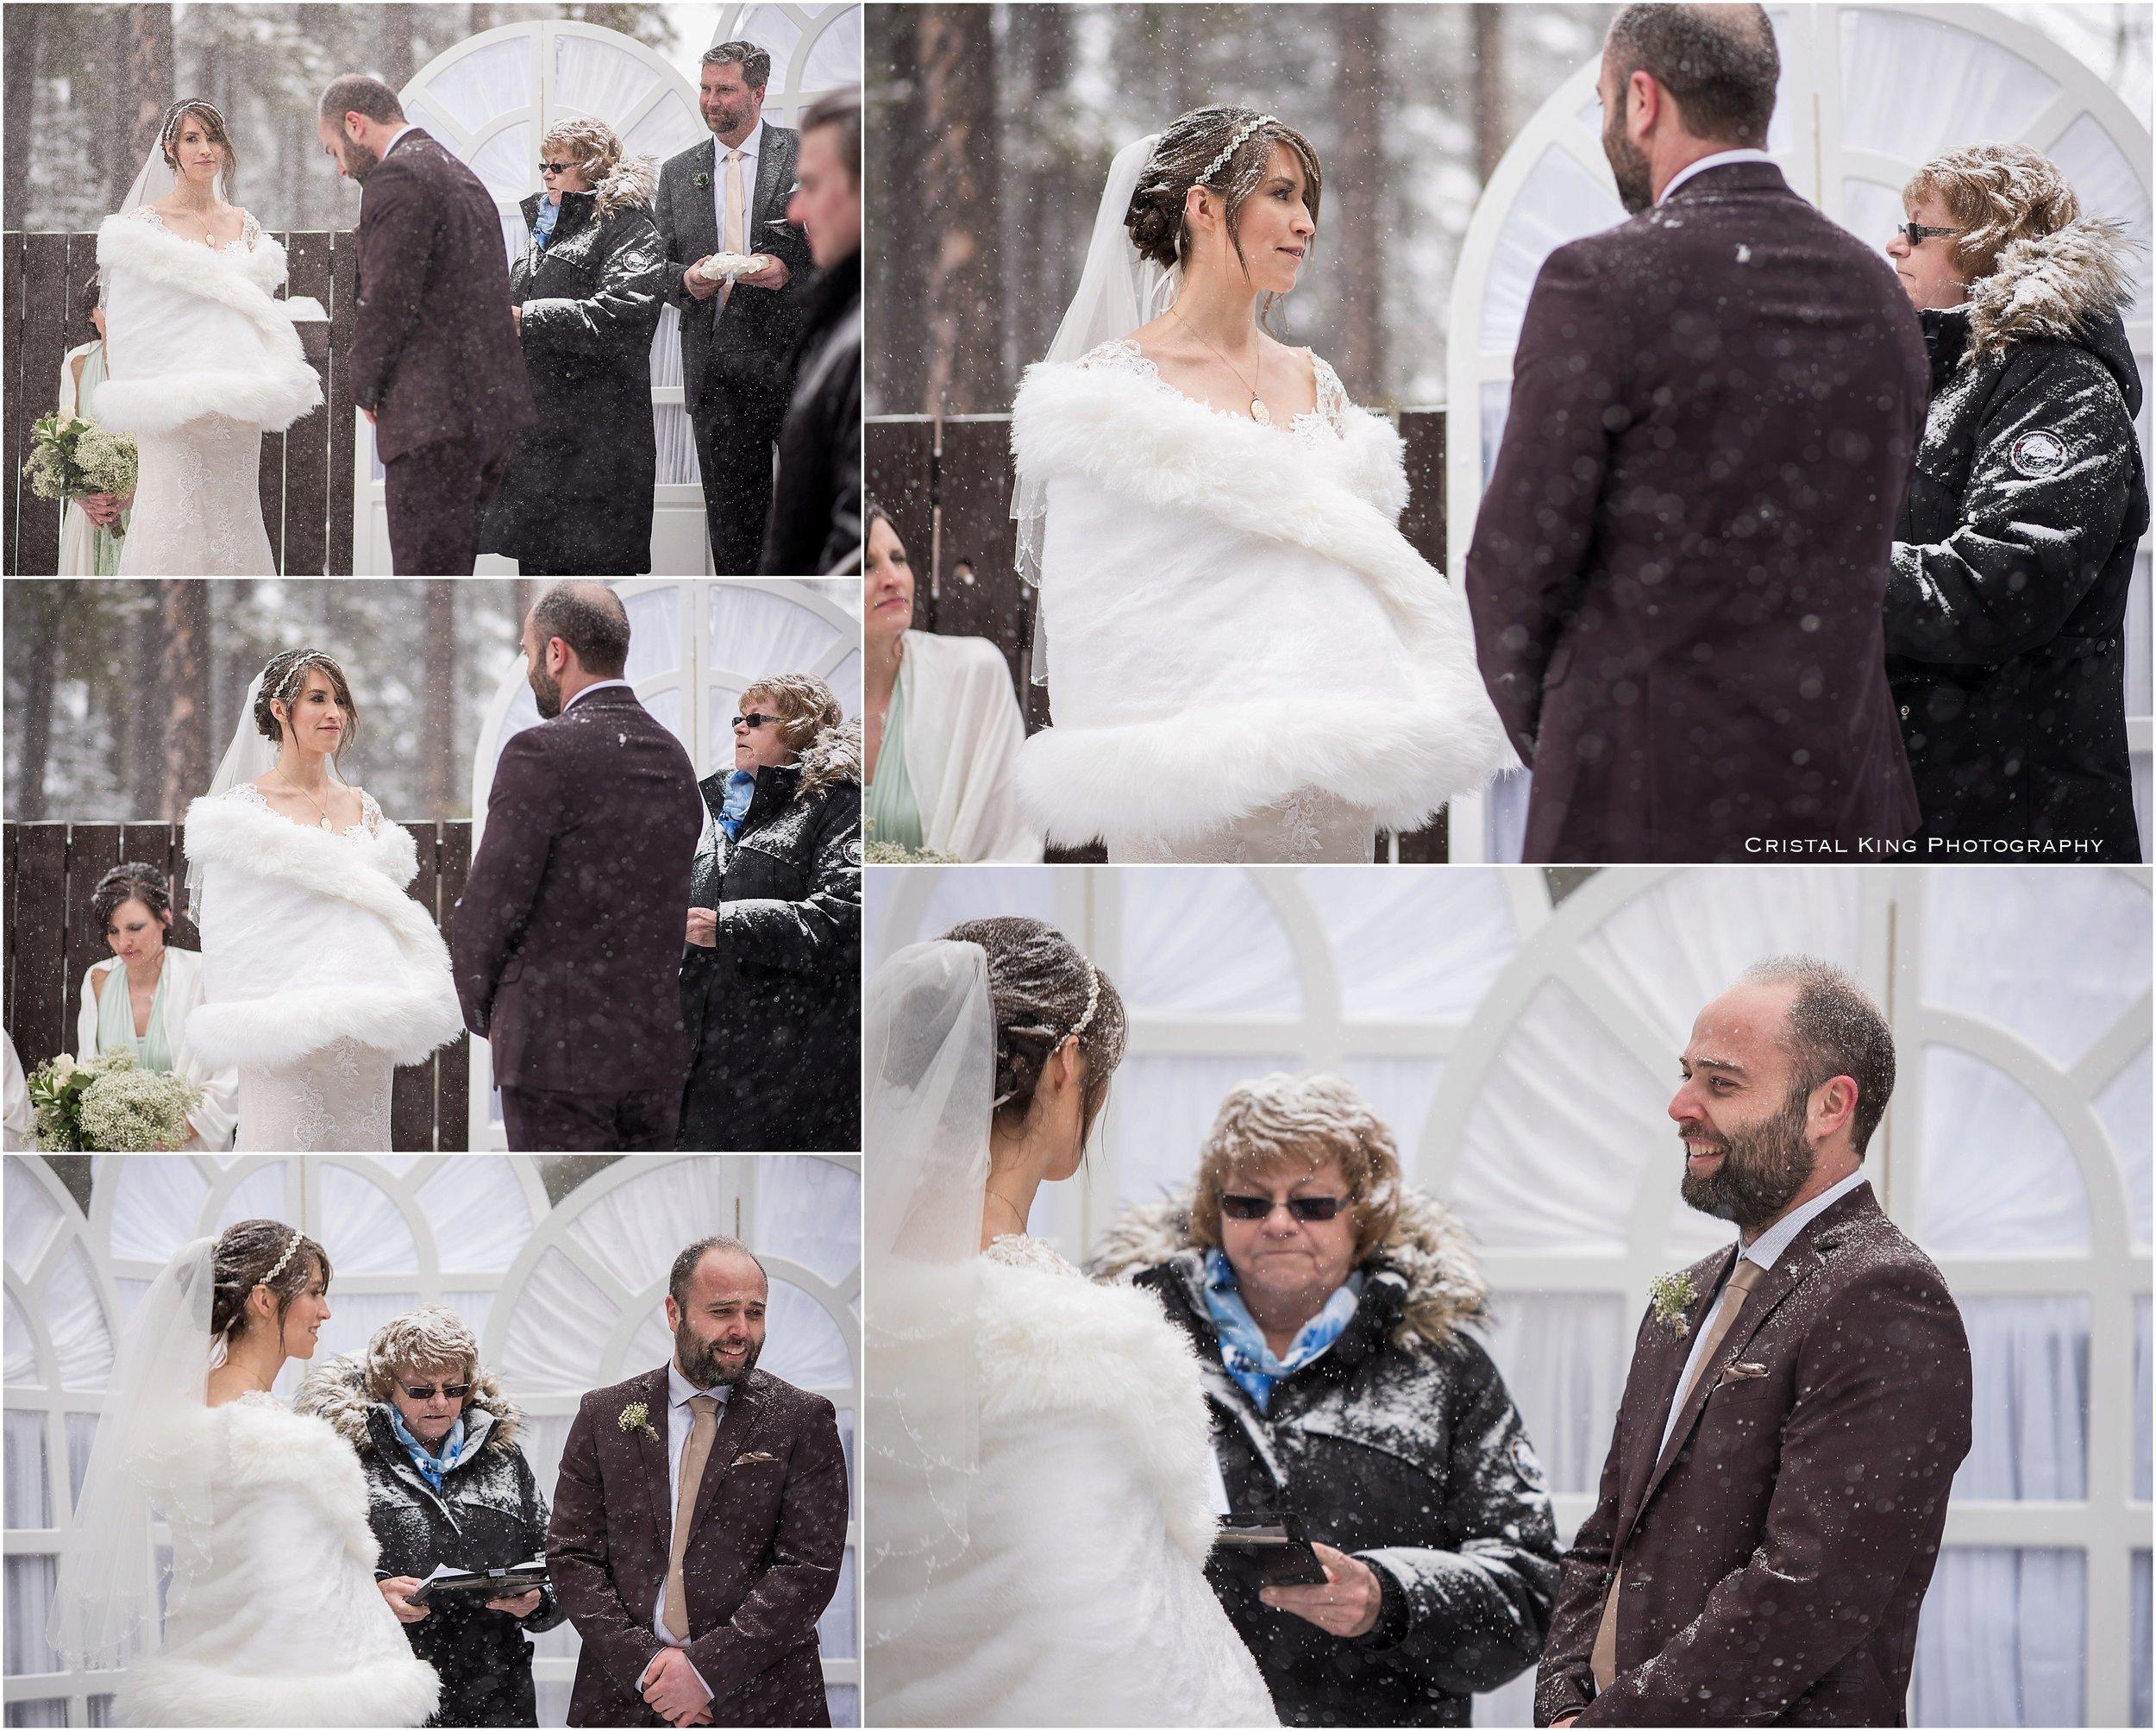 Jacqueline-Jasons-Wedding-25.jpg